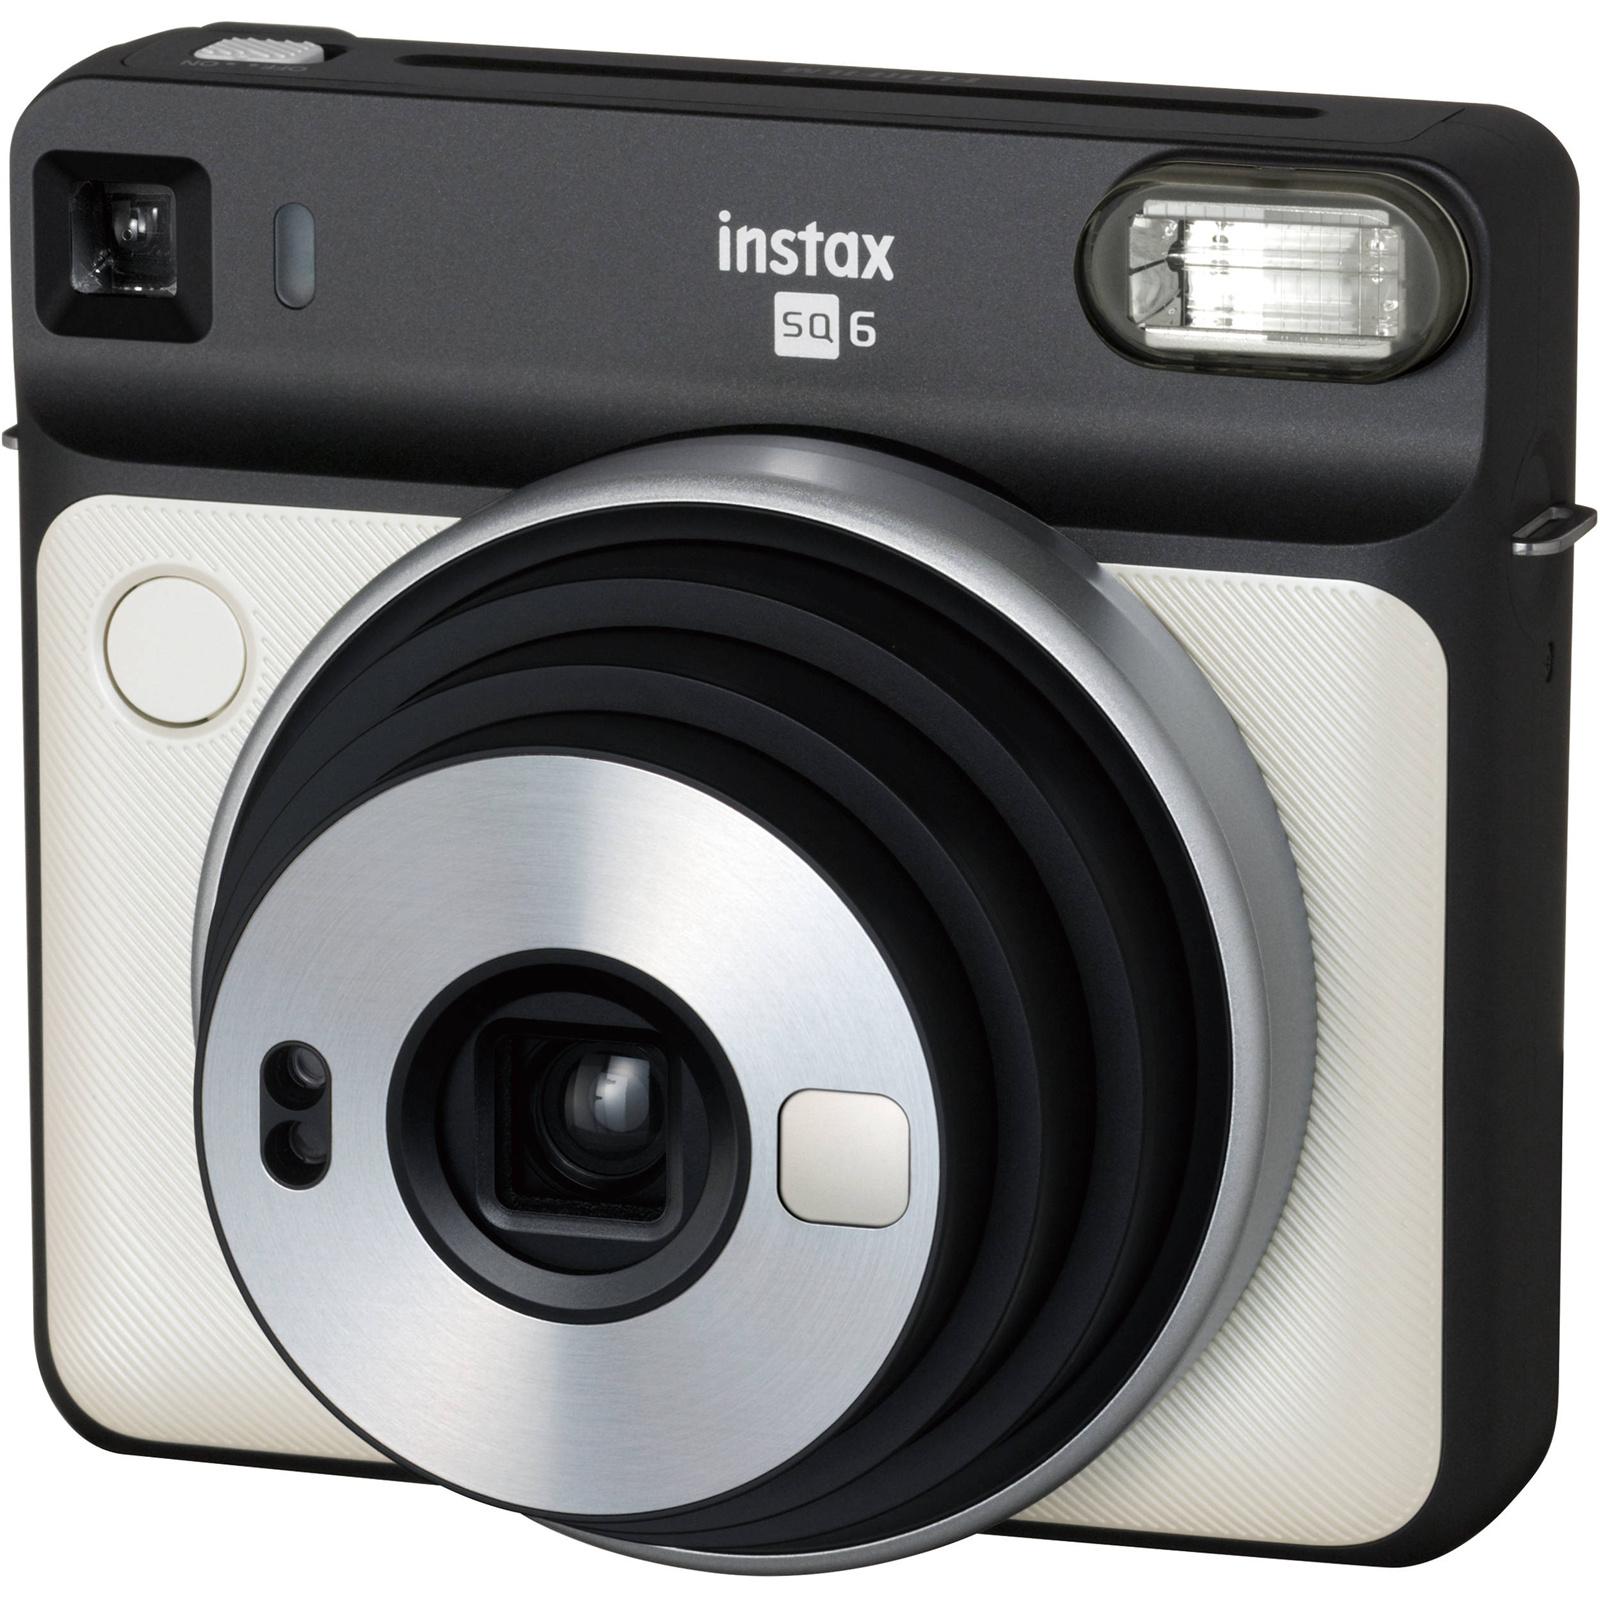 4df99d4747a69 Buy the FujiFilm Instax Square SQ6 Instant Camera Pearl White ...